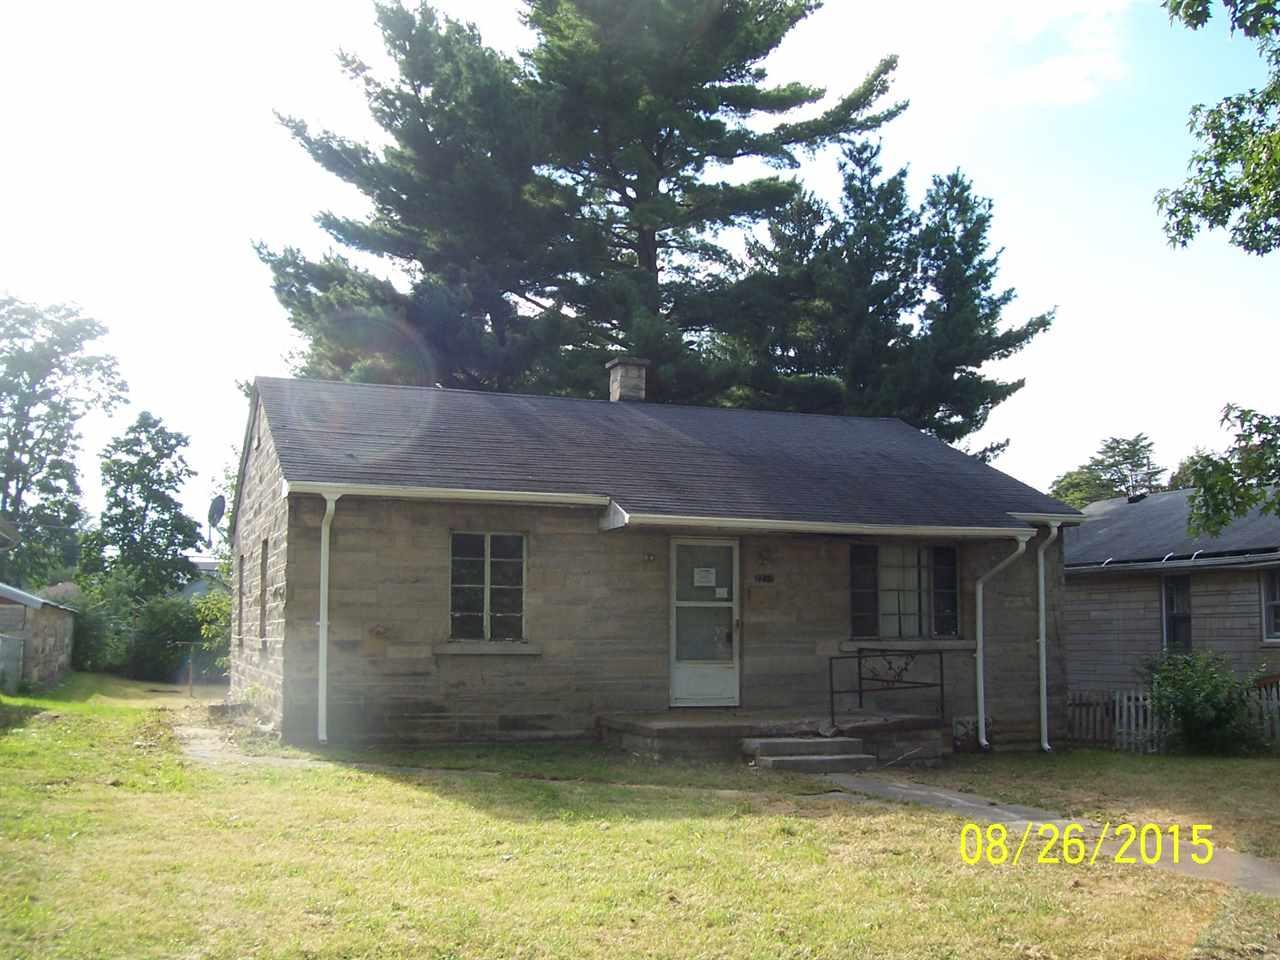 Real Estate for Sale, ListingId: 35106701, Bedford,IN47421